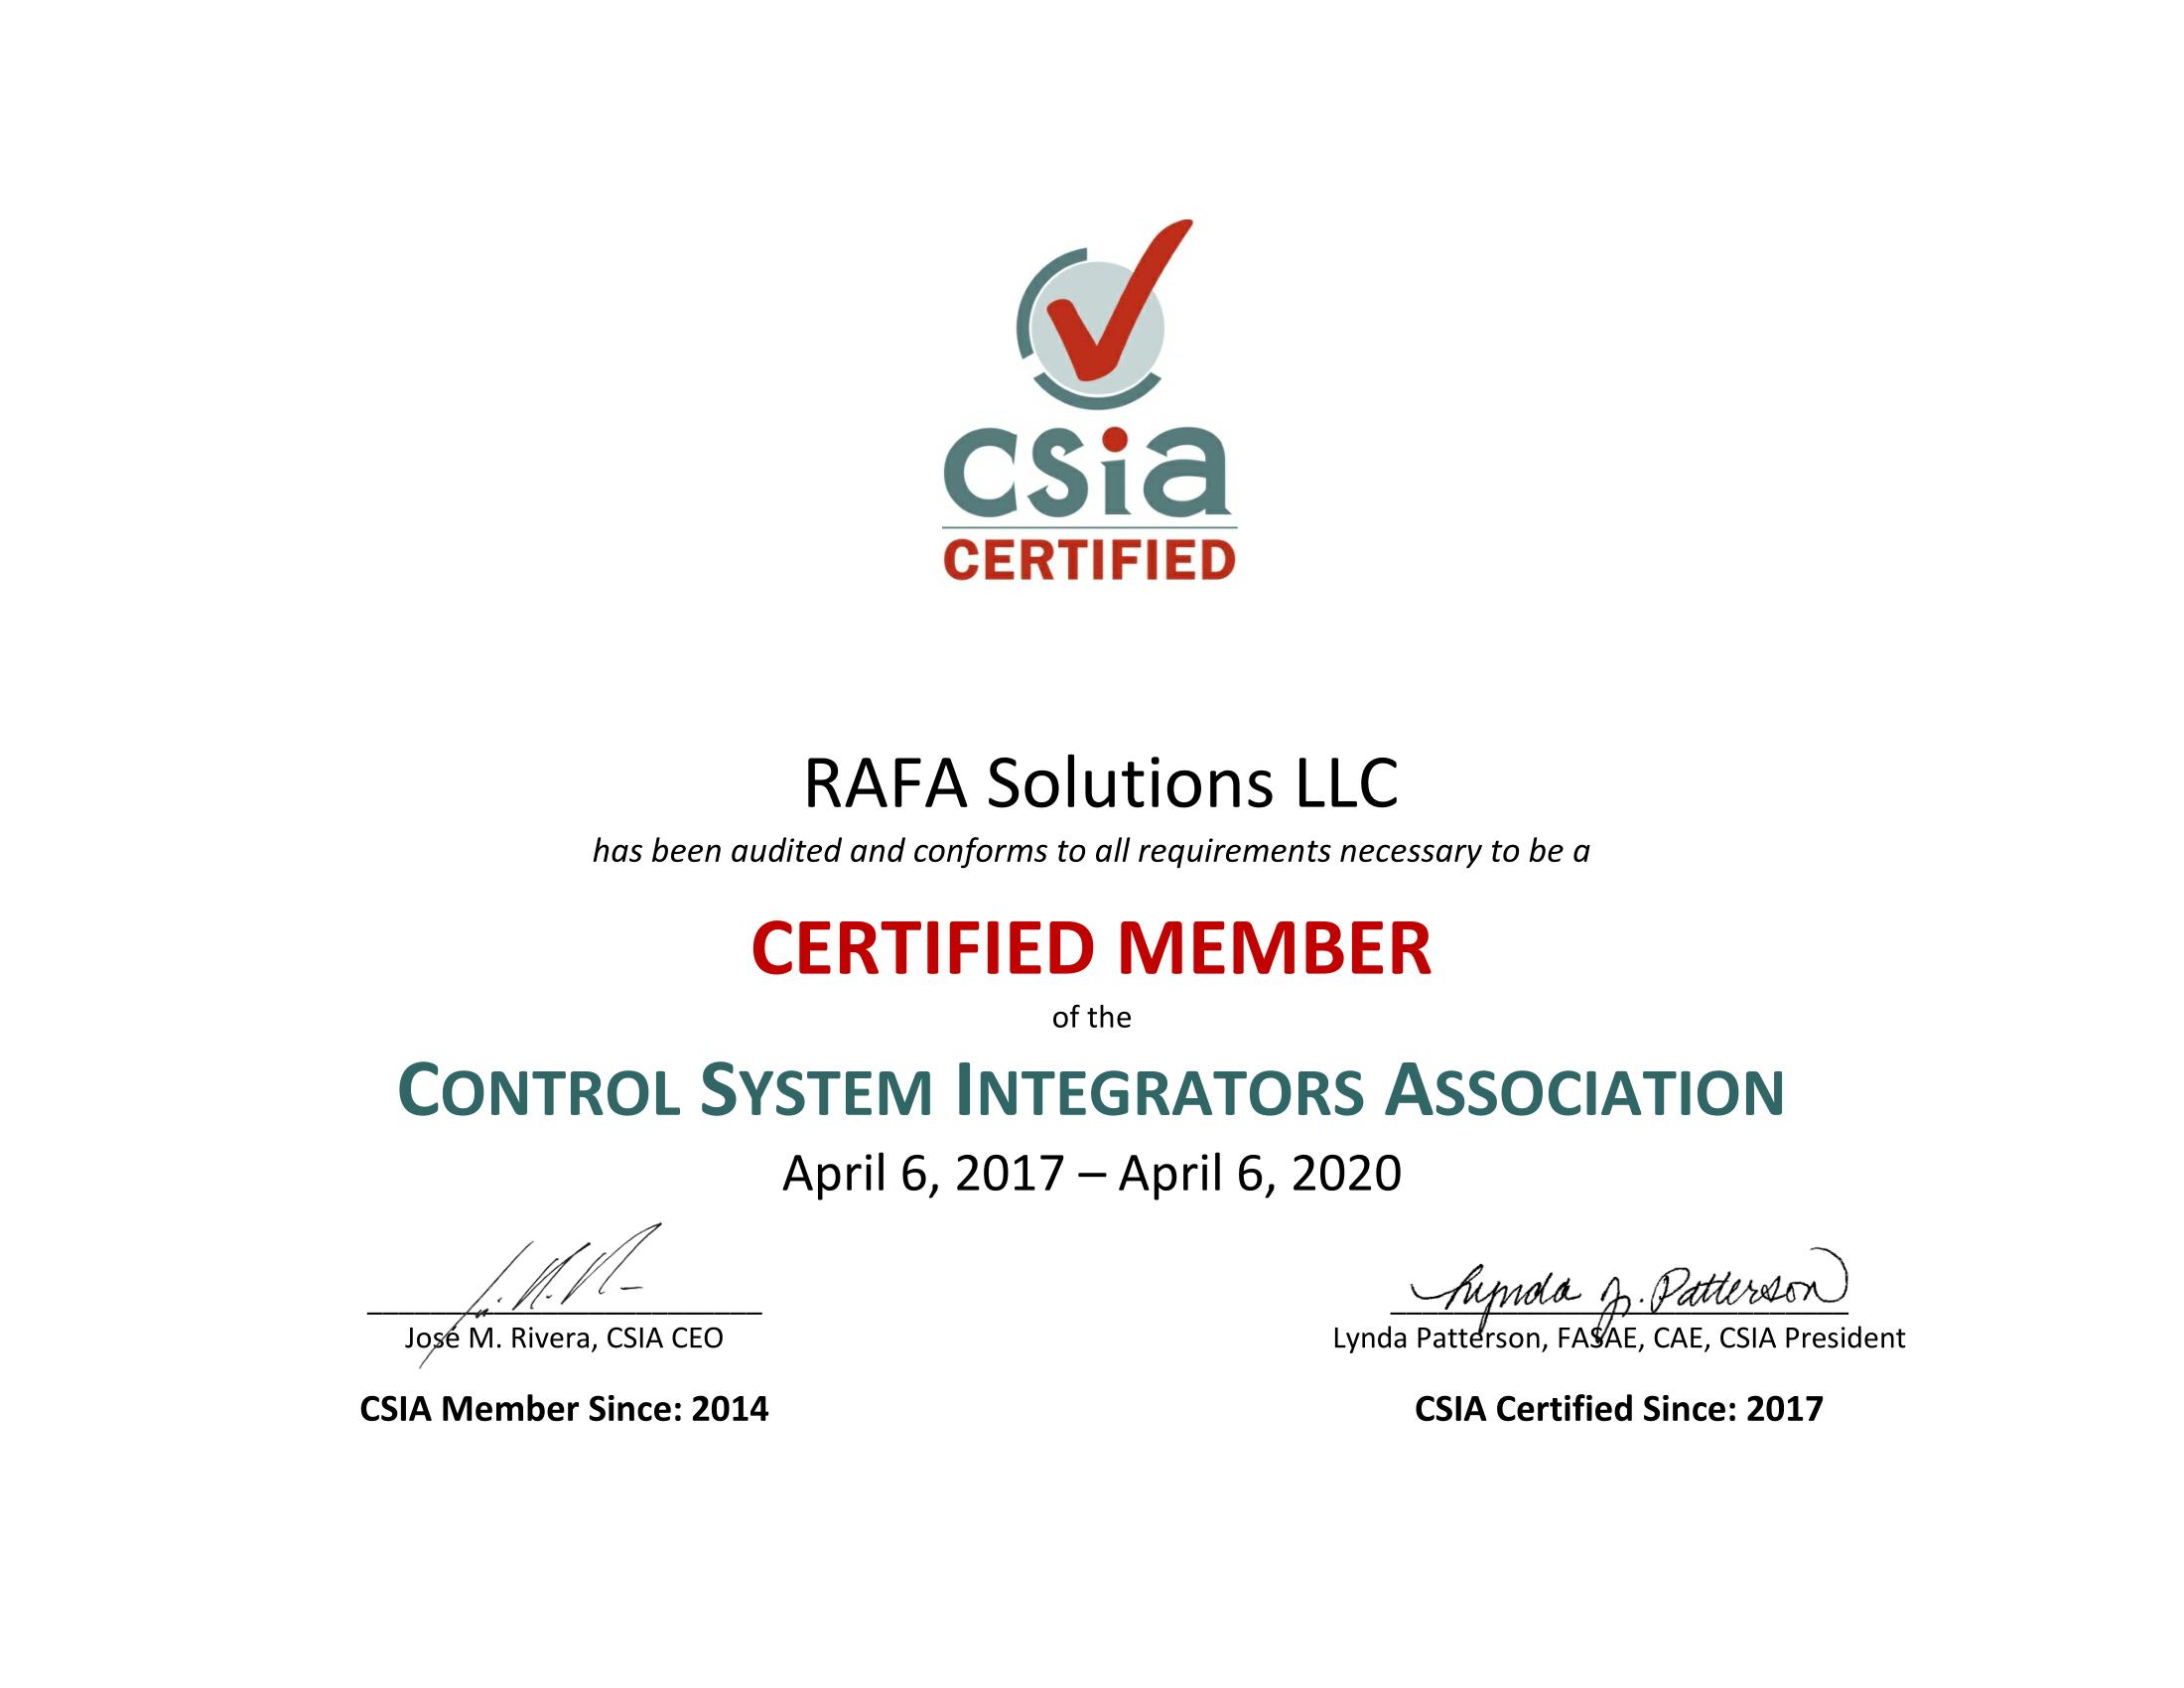 Certificate-RAFA-Solutions-2017-04-12-1